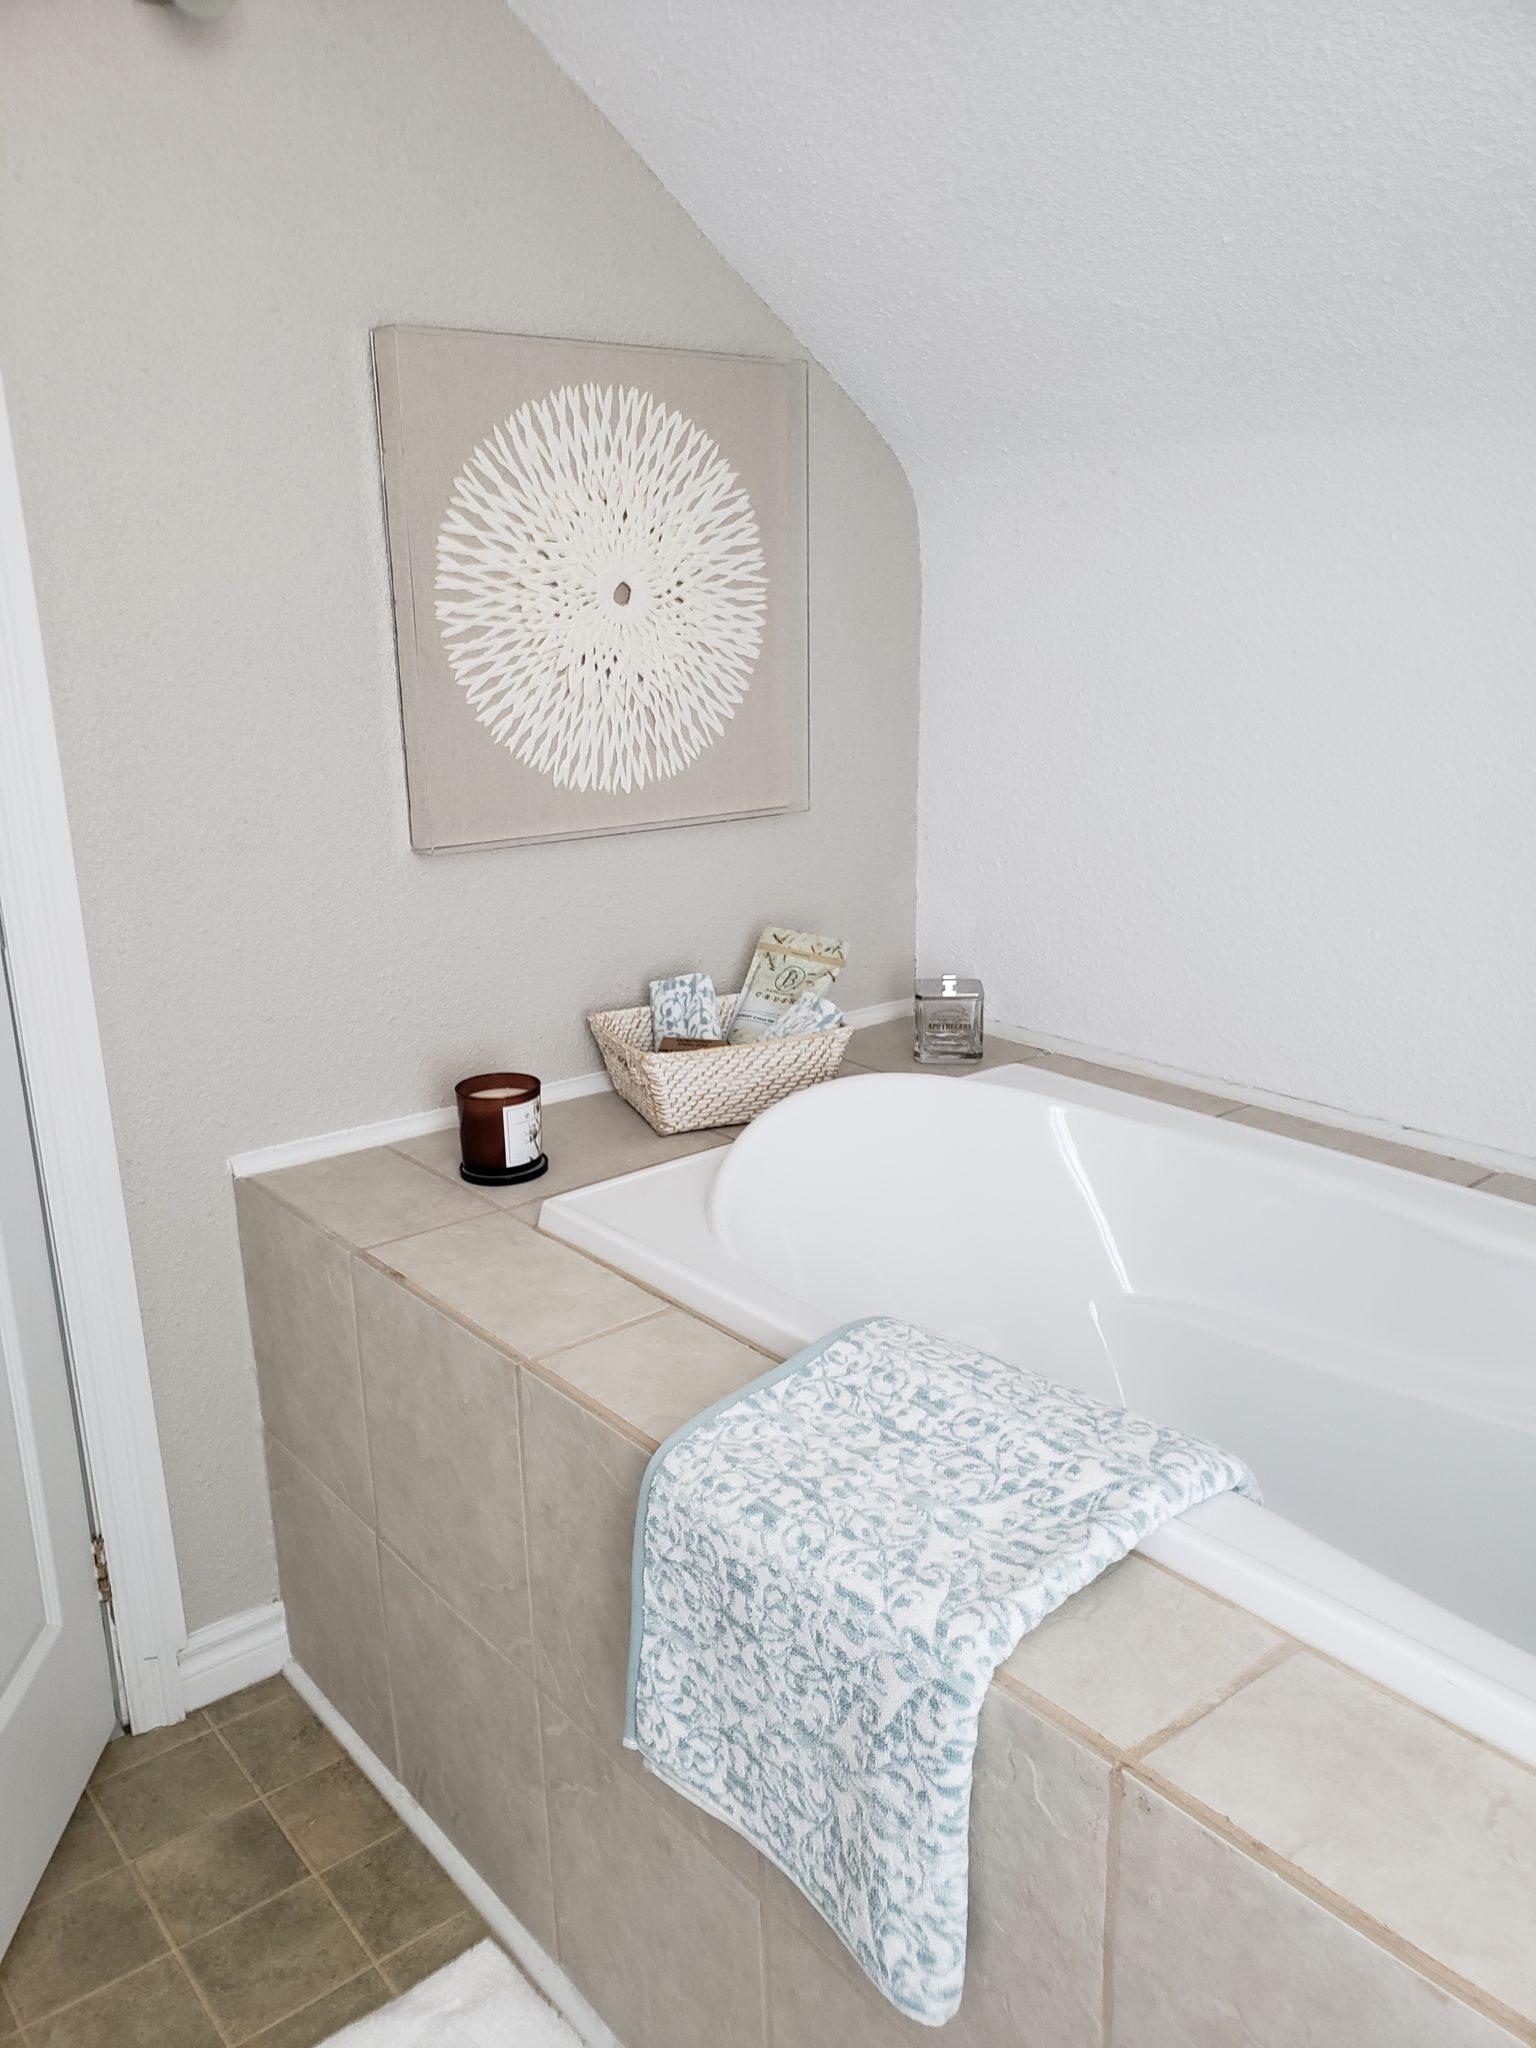 Bath area back - After